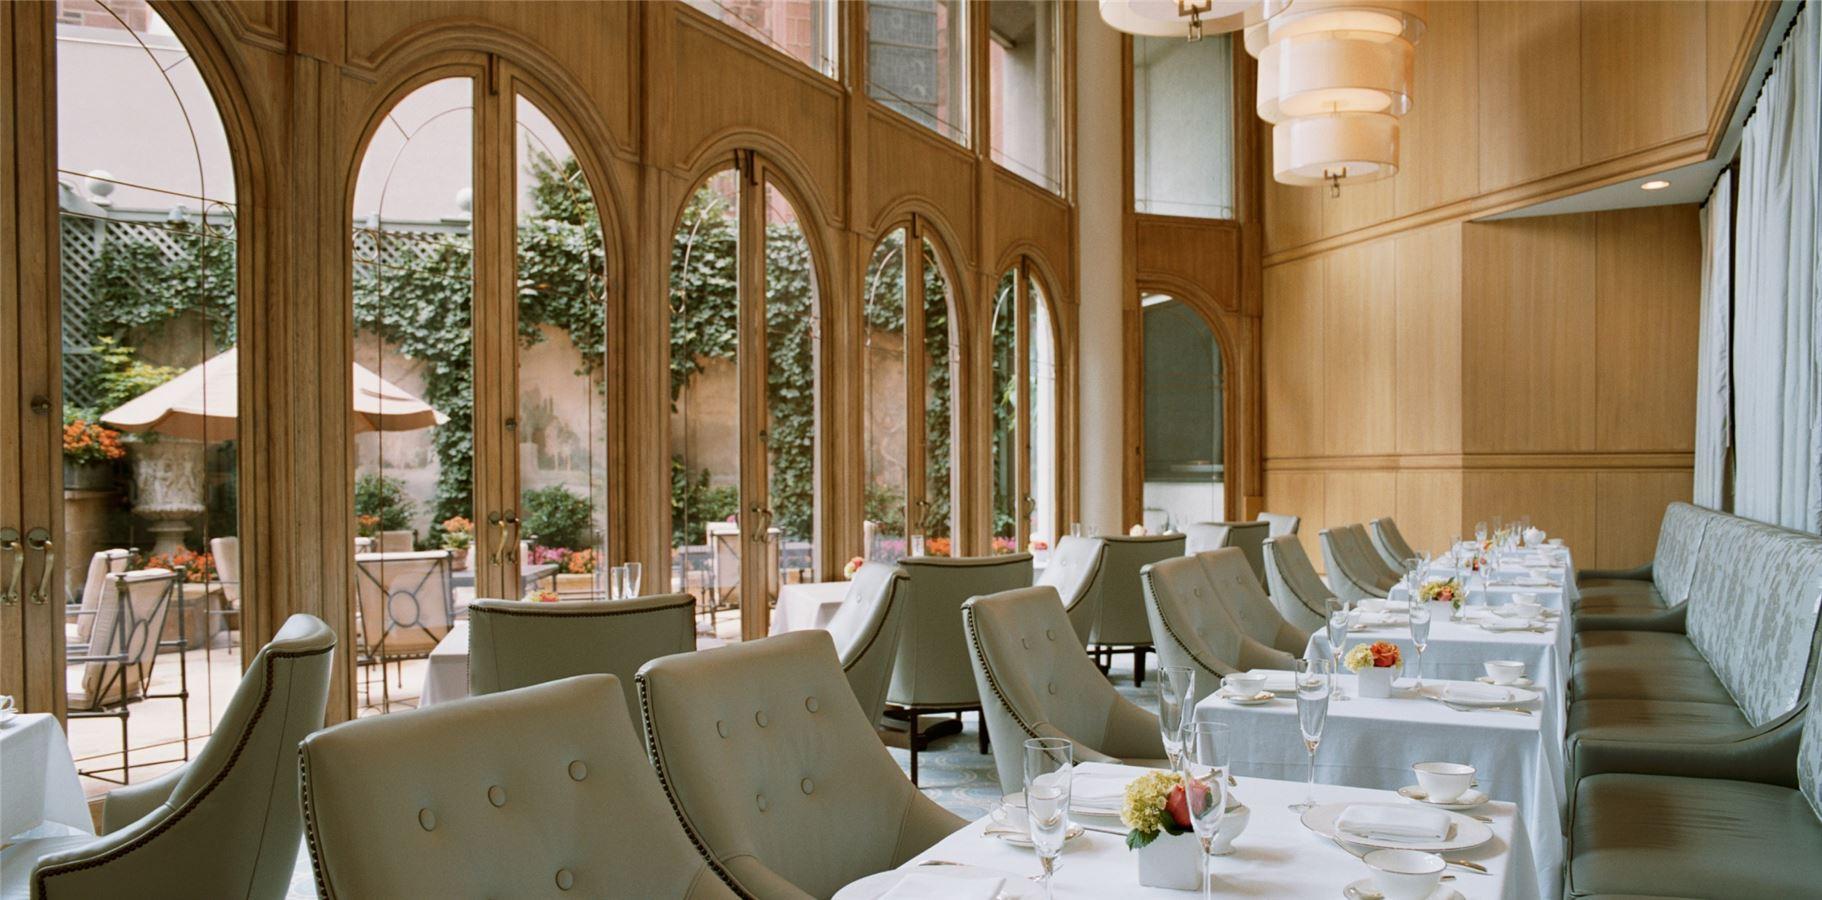 Lacroix Restaurant At The Rittenhouse Fine Dining In Philadelphia